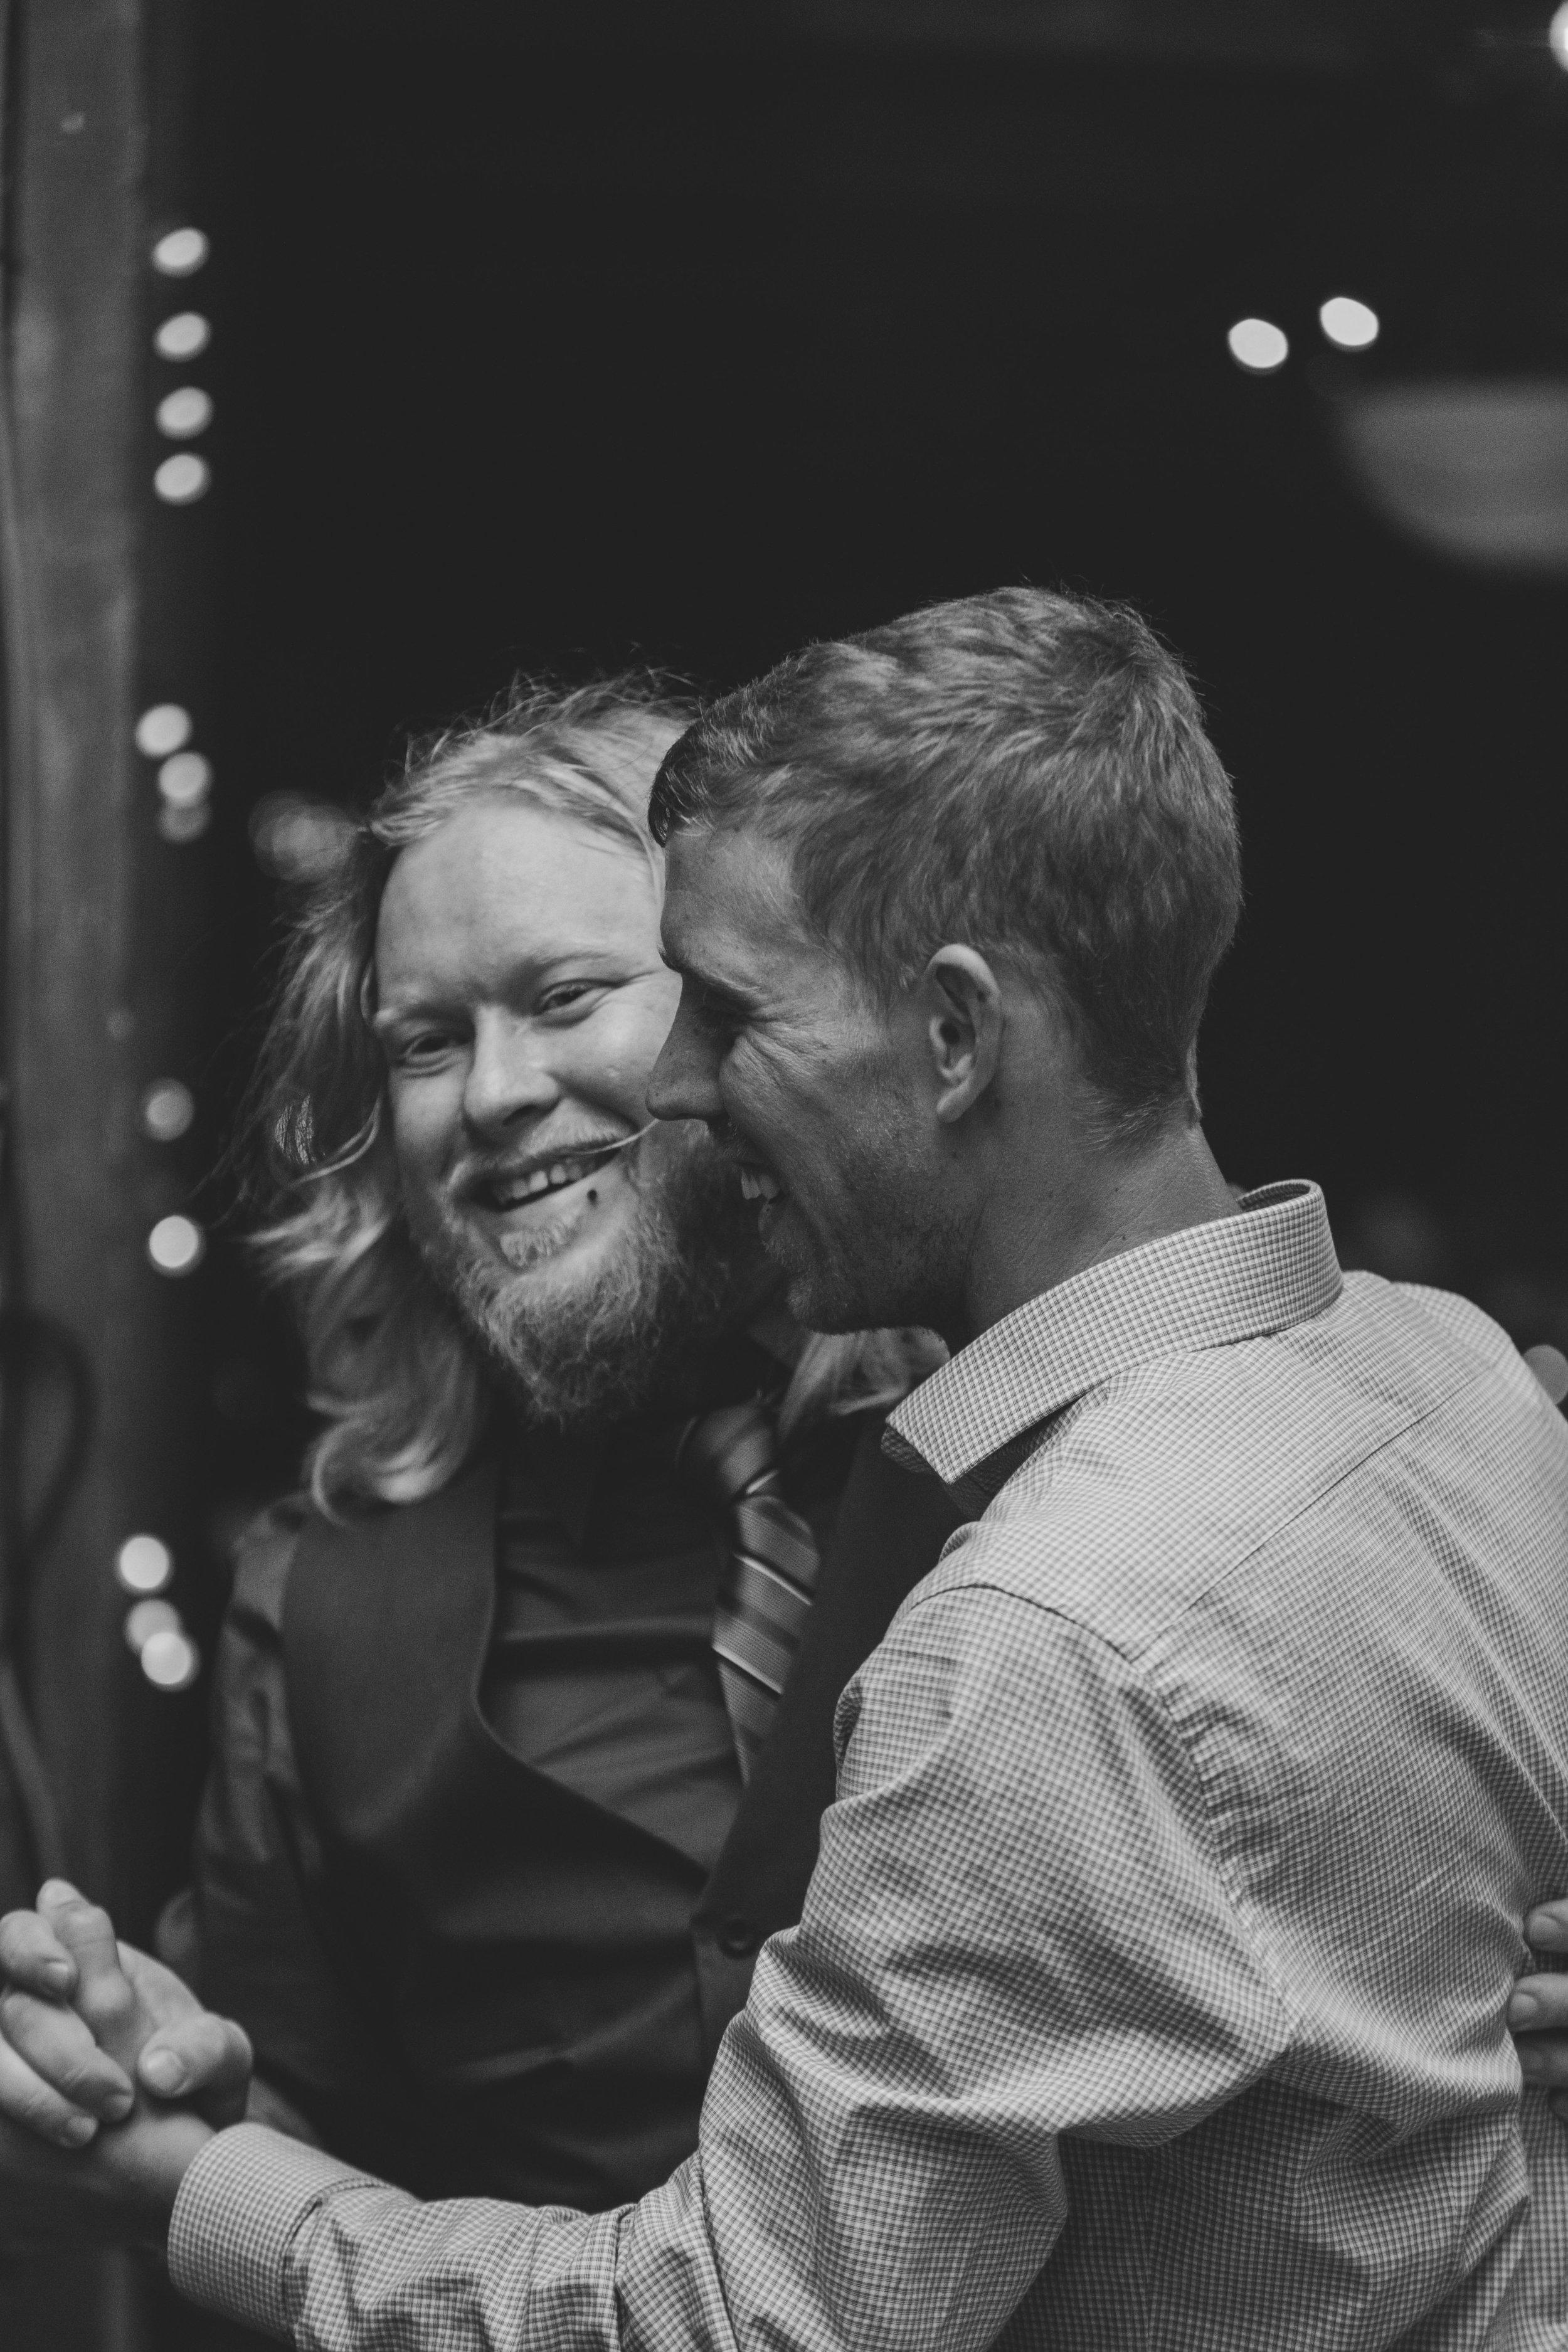 ATGI_Magali & Josh Wedding1_2S8A2678.jpg